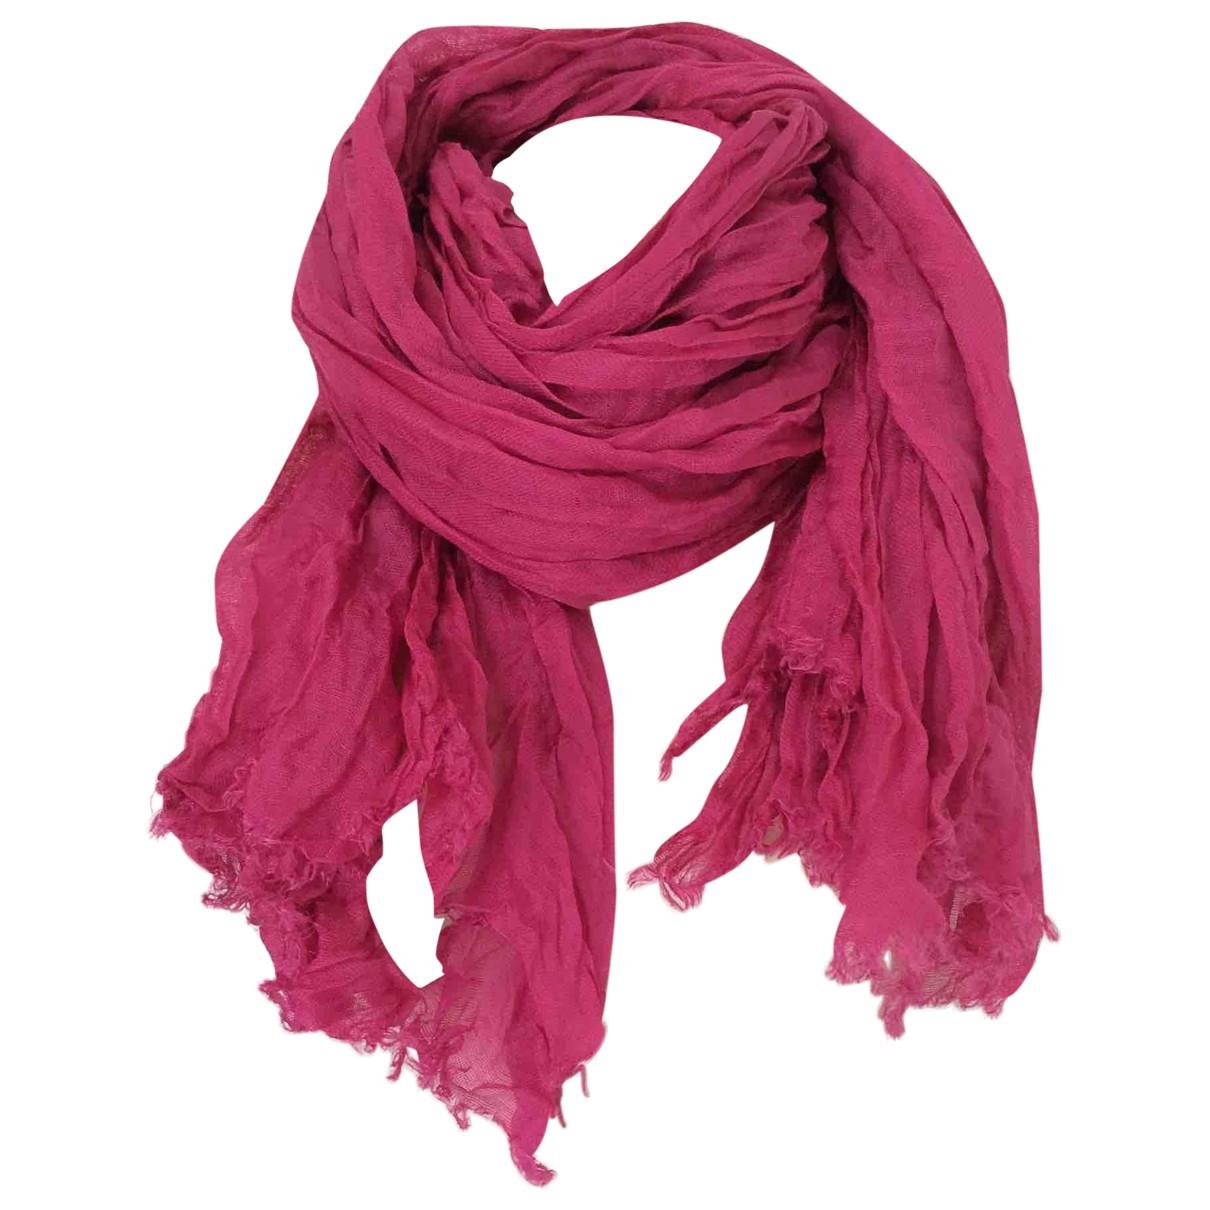 Max Mara - Foulard   pour femme en lin - rose